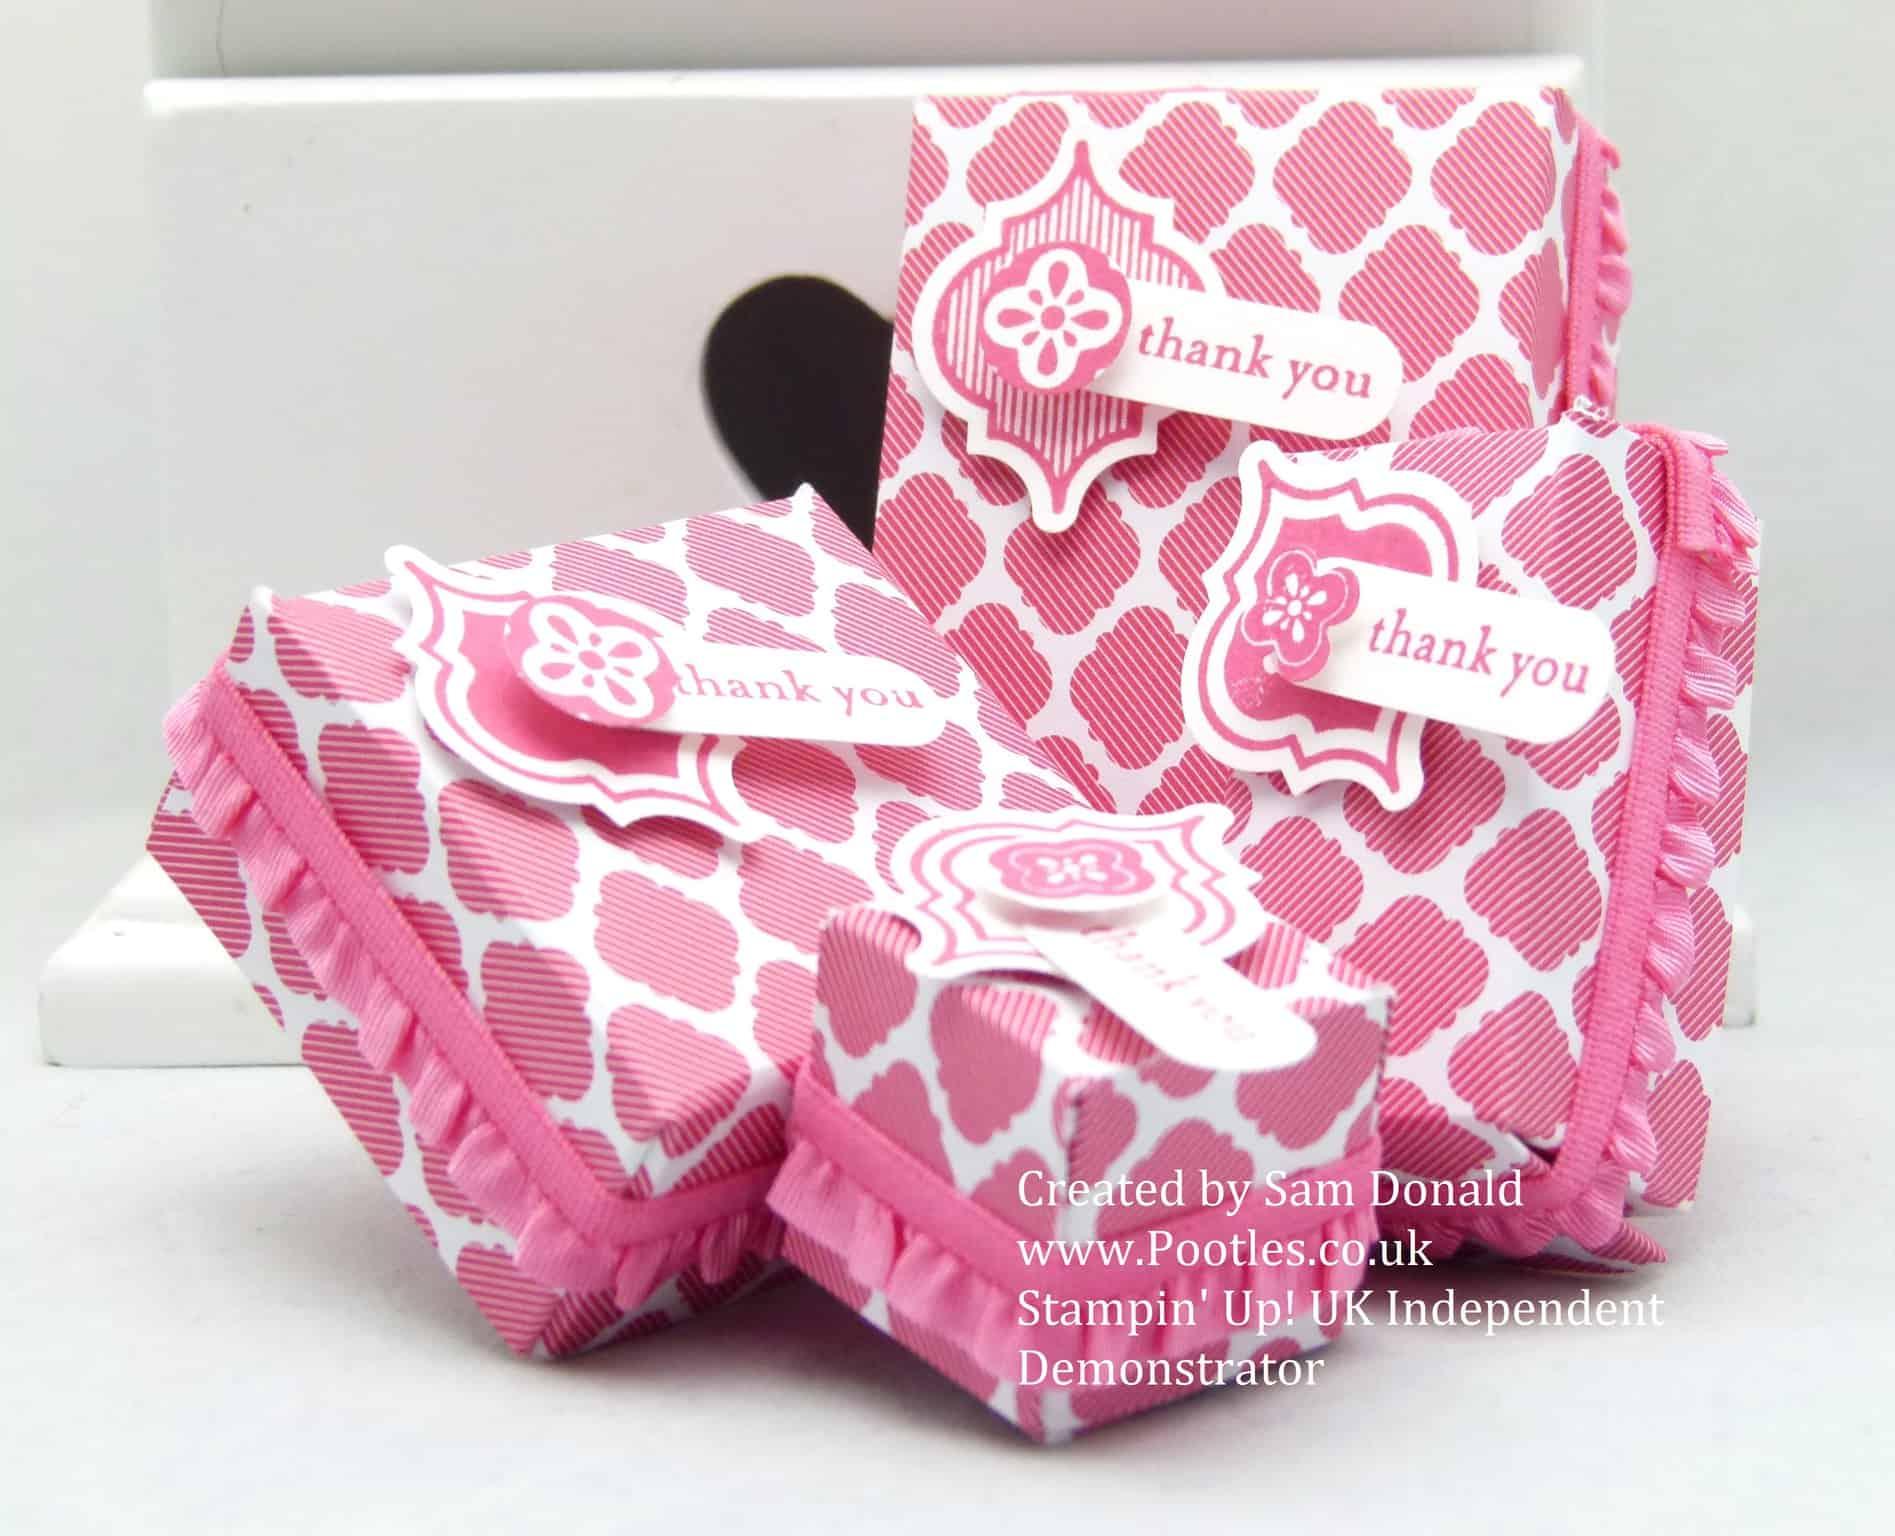 Pinkies Stampin' Up! Annual Catalogue Blog Hop!